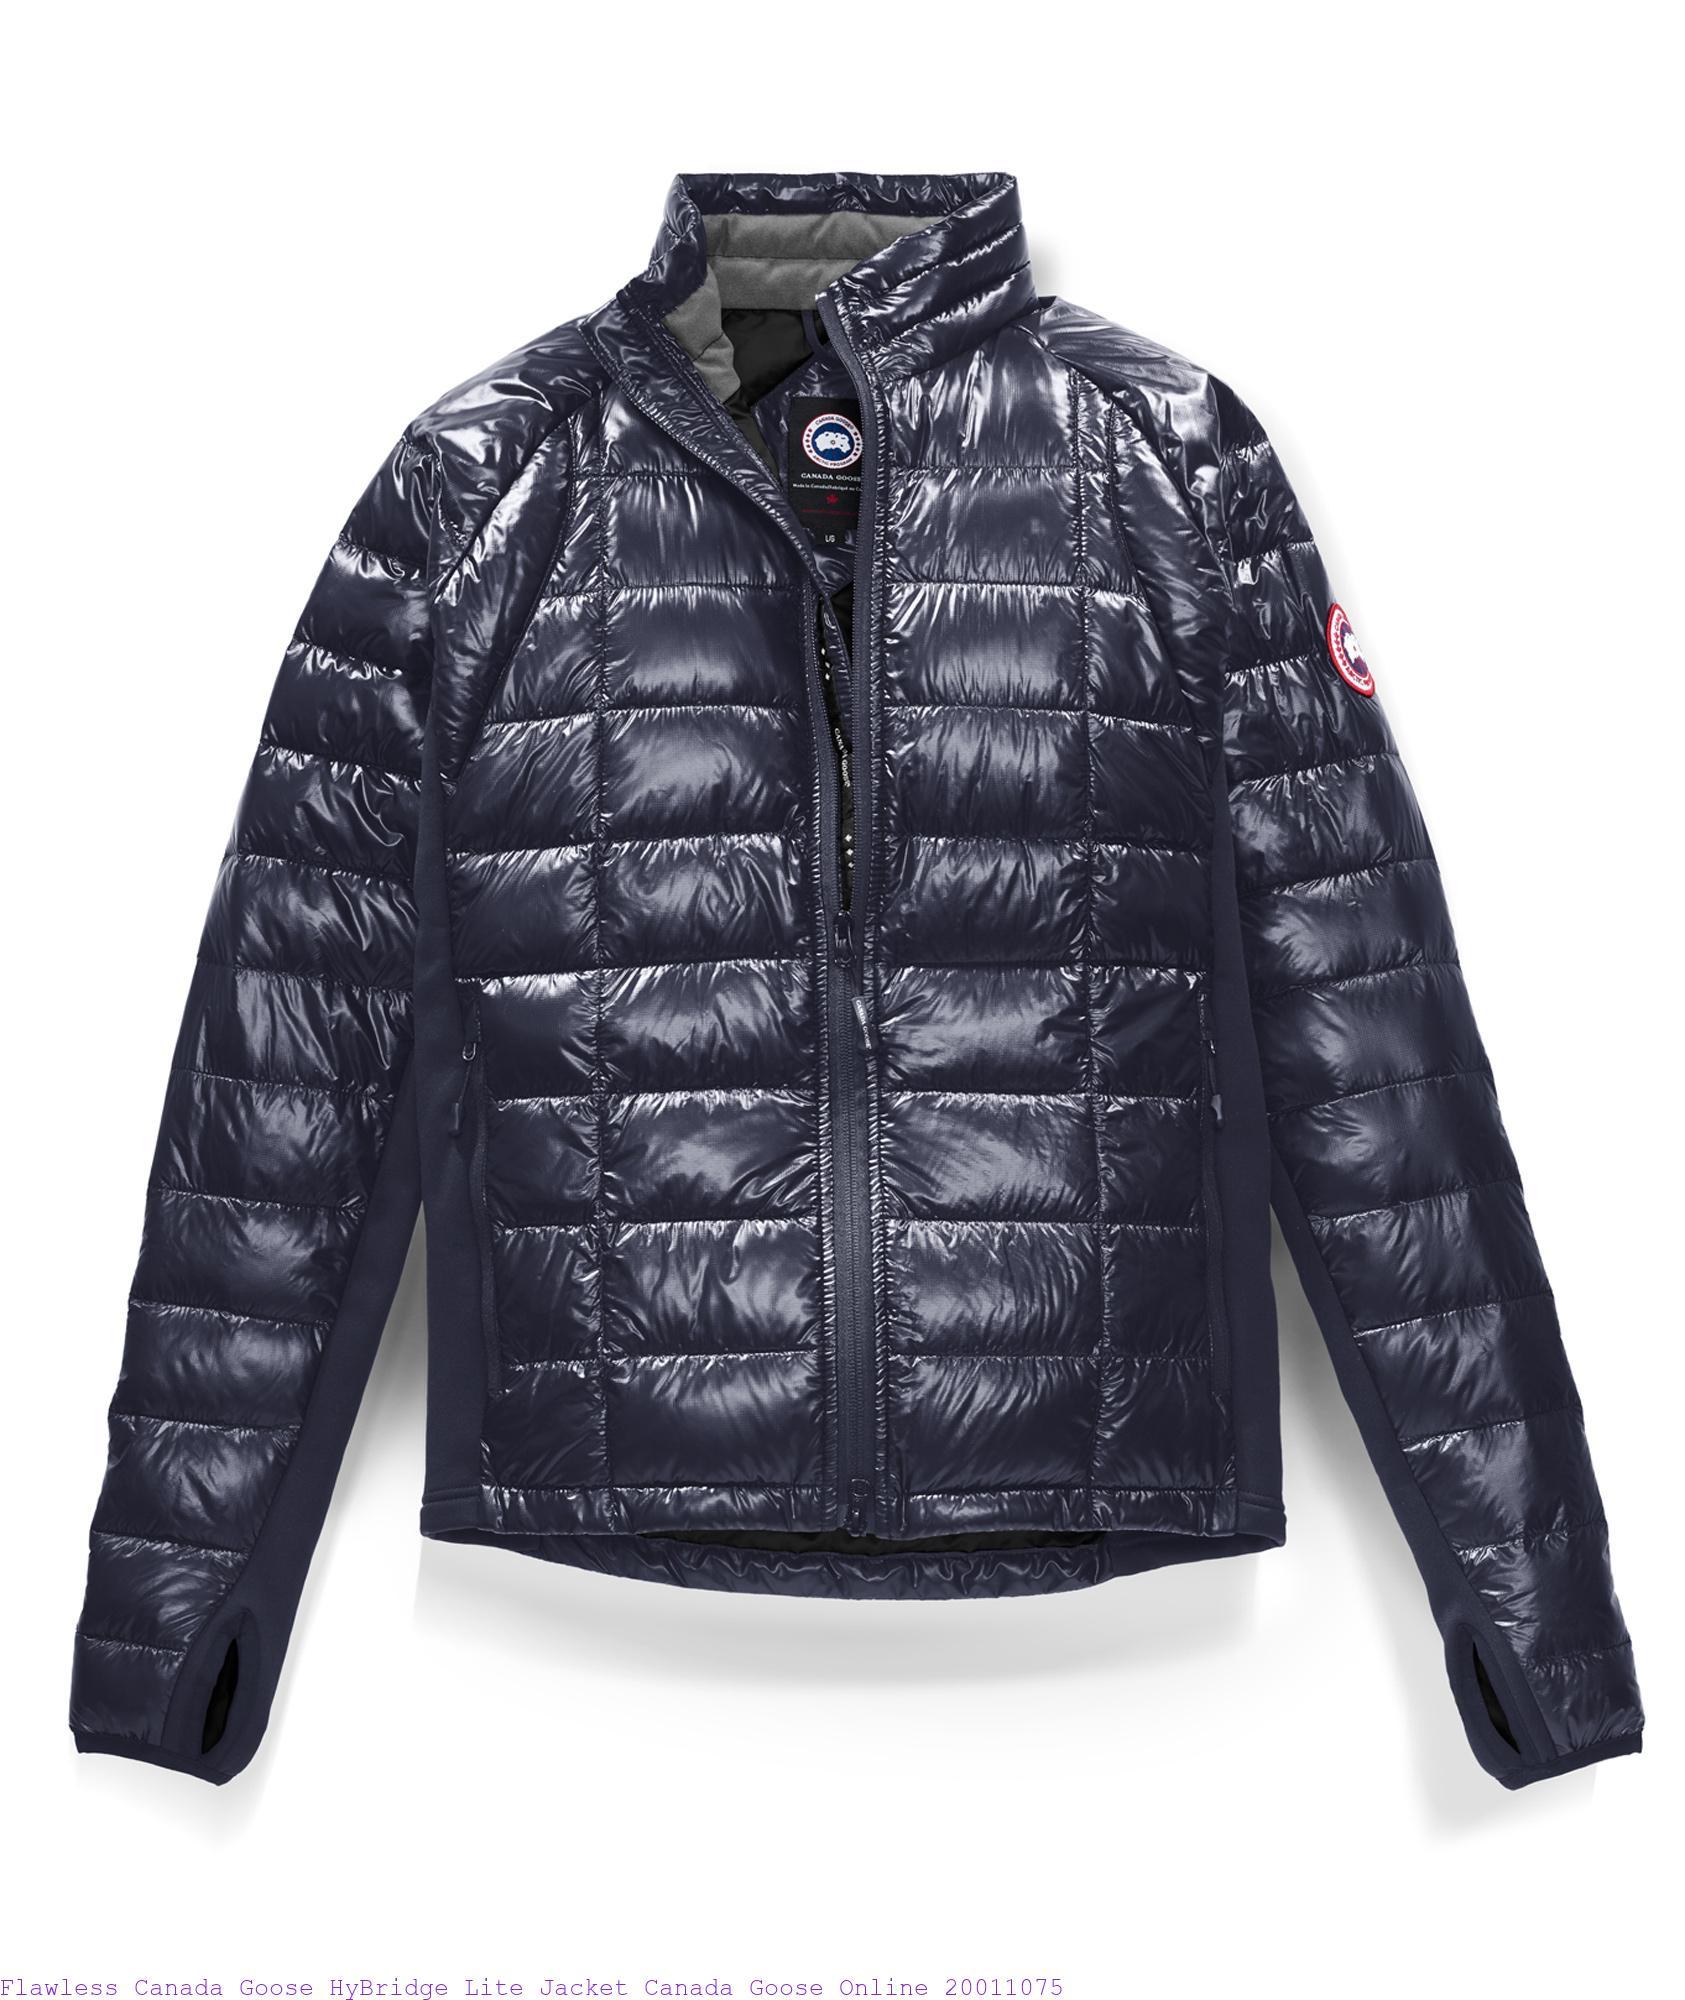 Flawless Canada Goose HyBridge Lite Jacket Canada Goose Online 20011075 –  Cheap Canada Goose® Outlet Jackets Online  320d7a3d812c